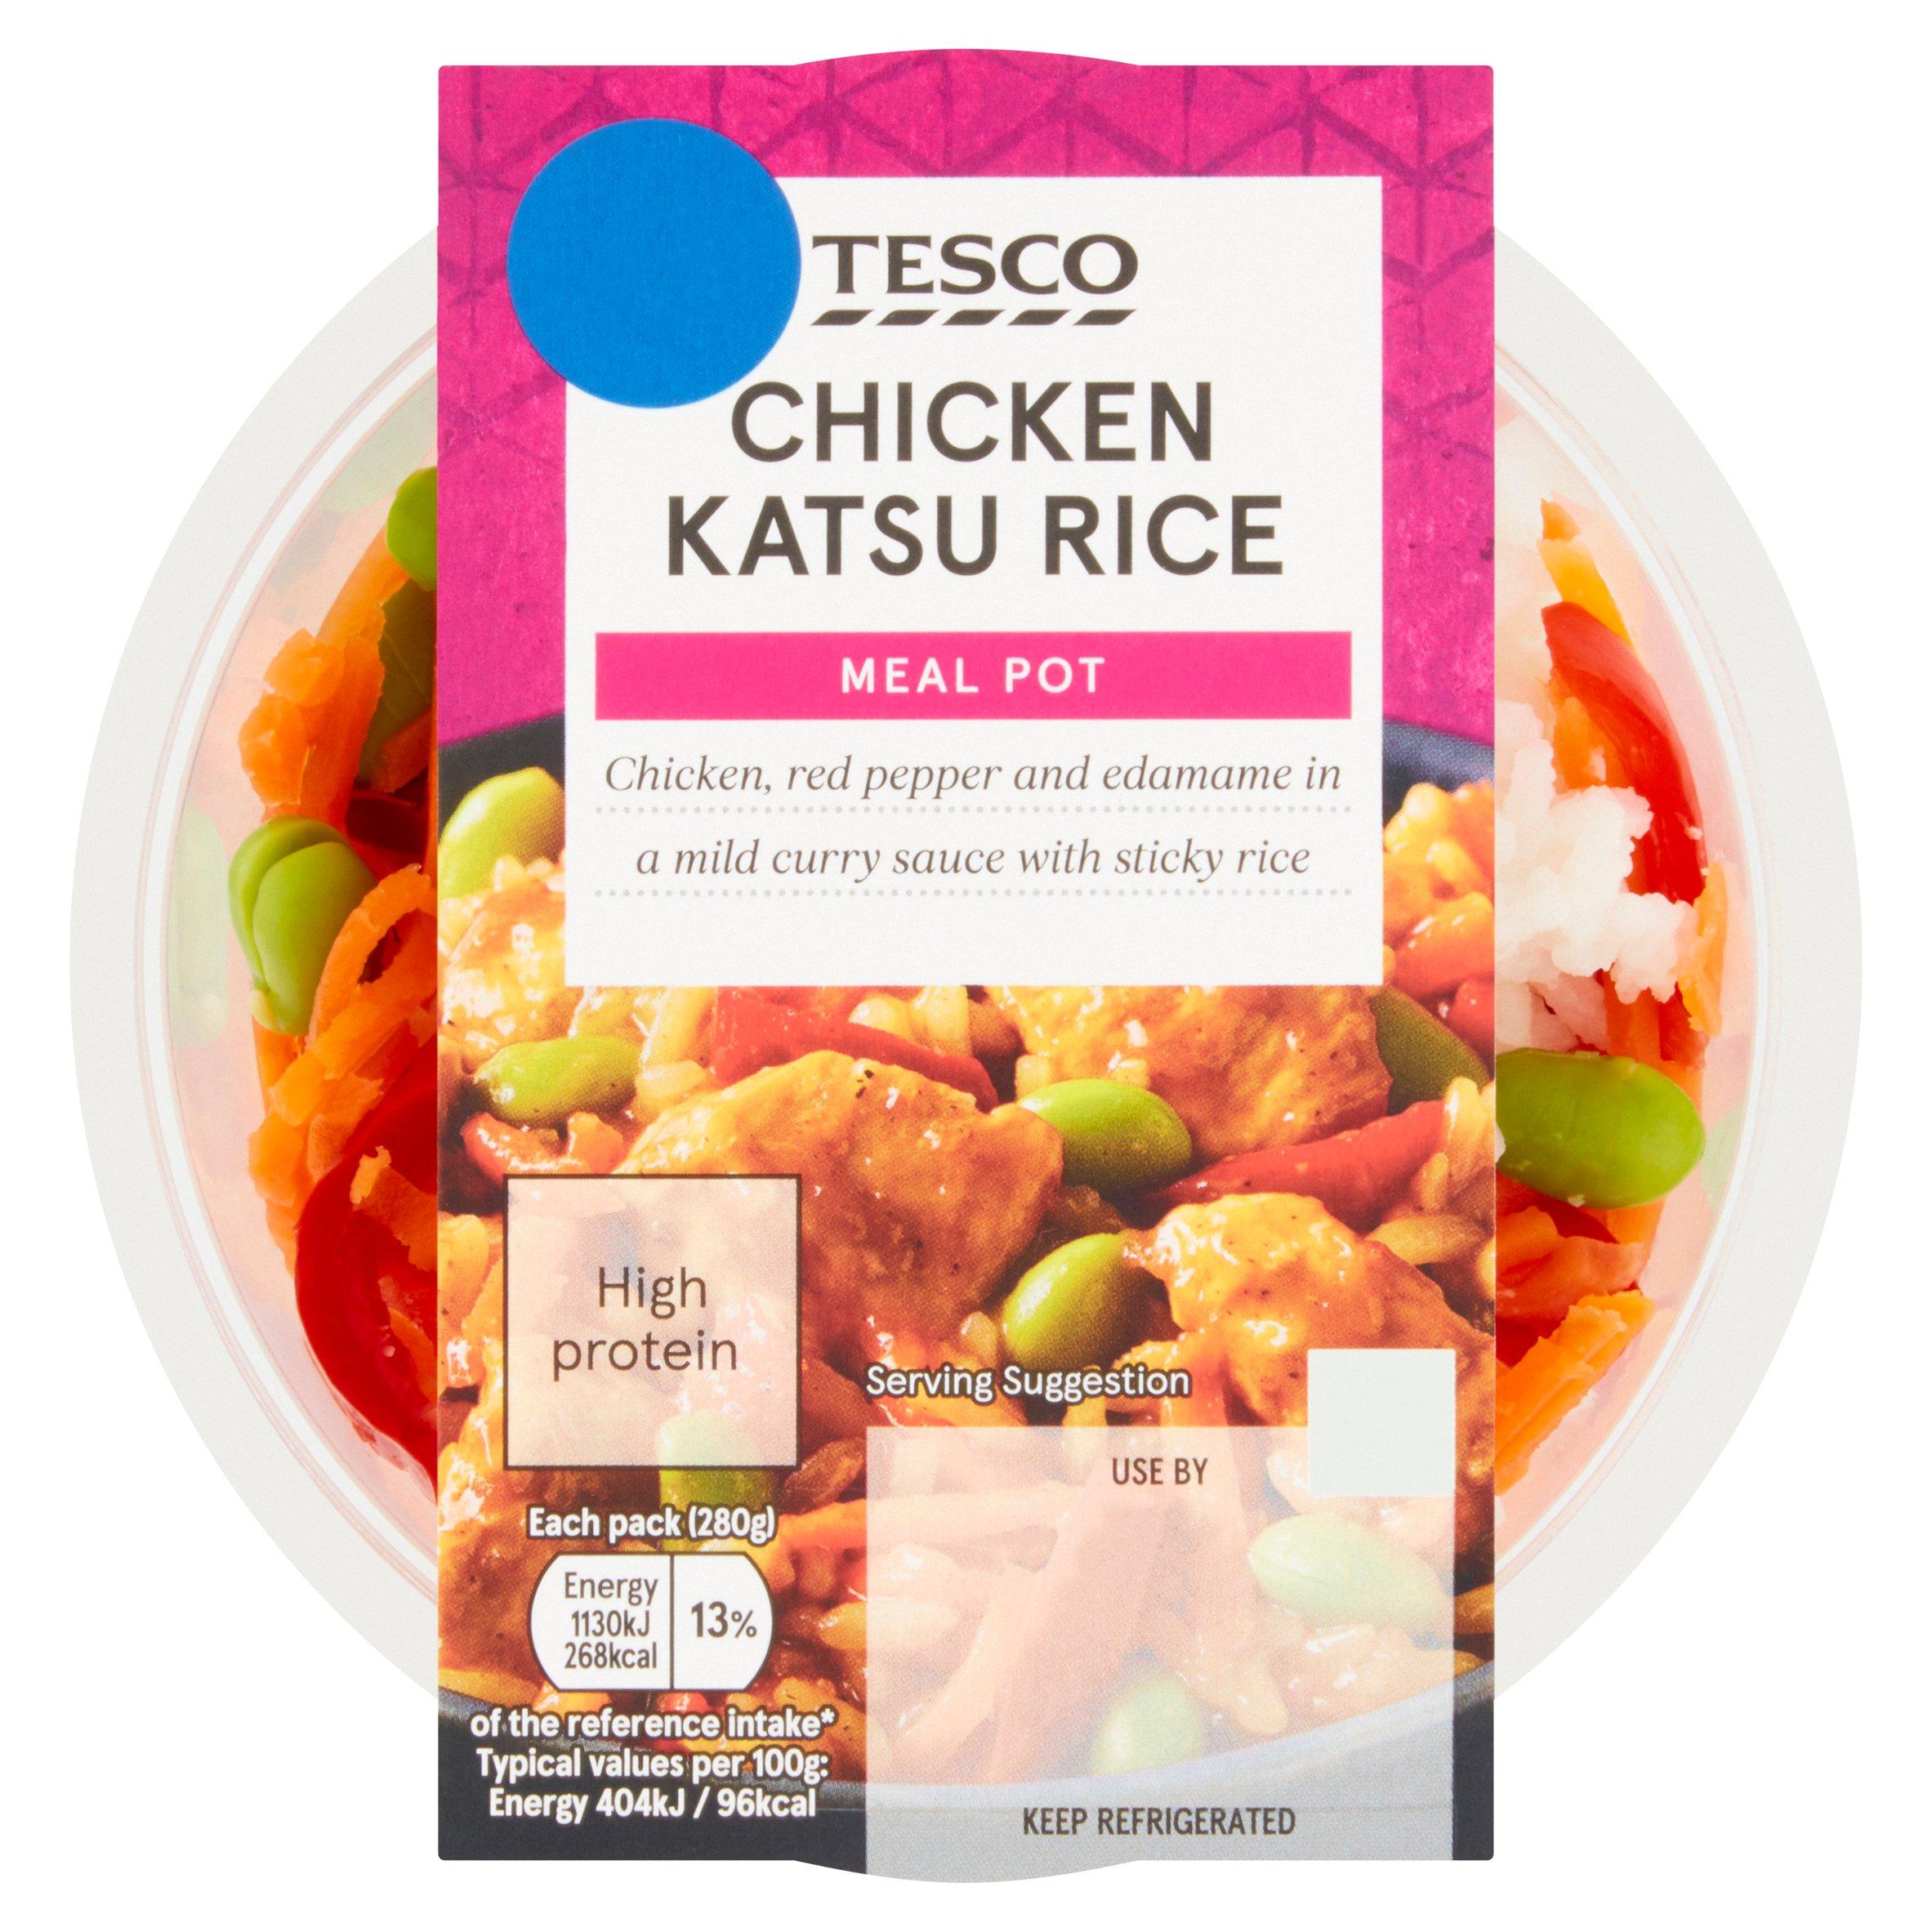 Tesco Chicken Katsu Rice Meal Pot 280G